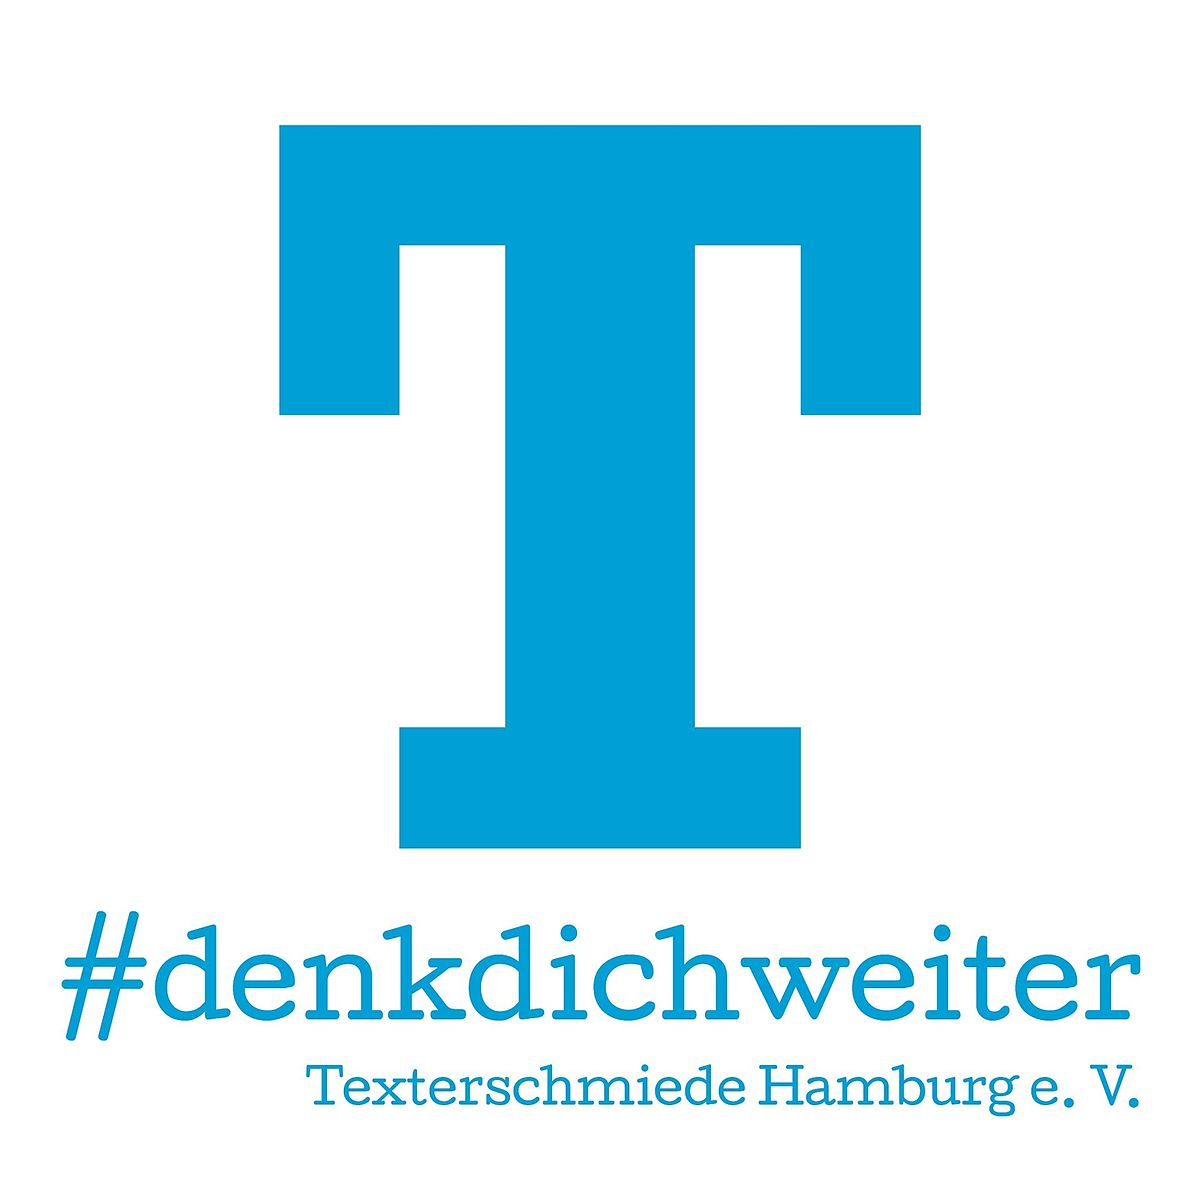 Texterschmiede Hamburg – Wikipedia